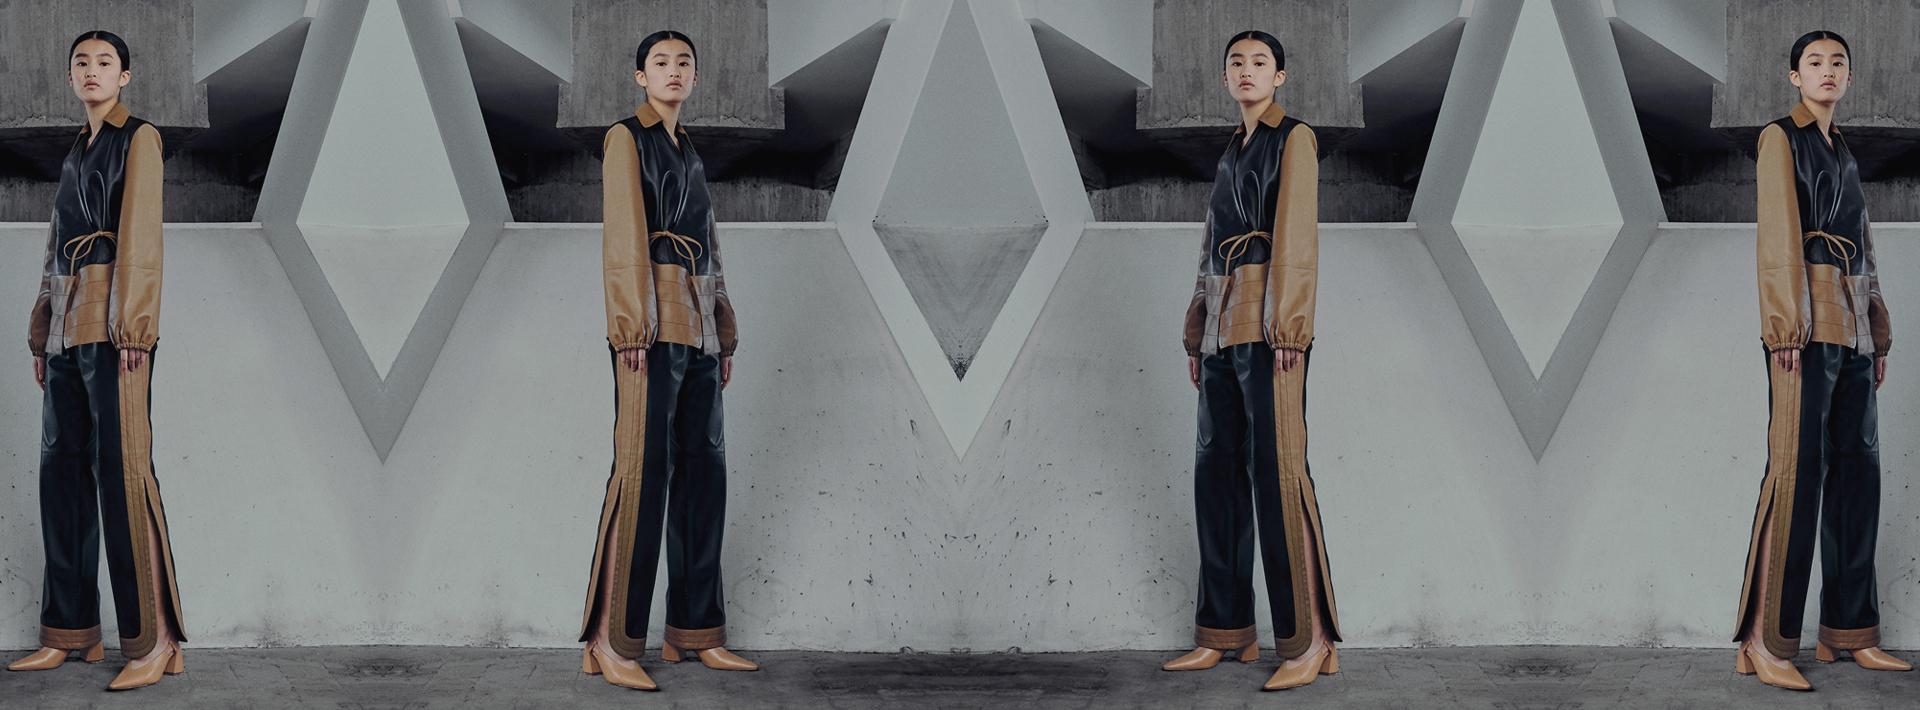 How Kirin expresses Peggy Gou's energy thru experimental designs on premium leather silhouettes.